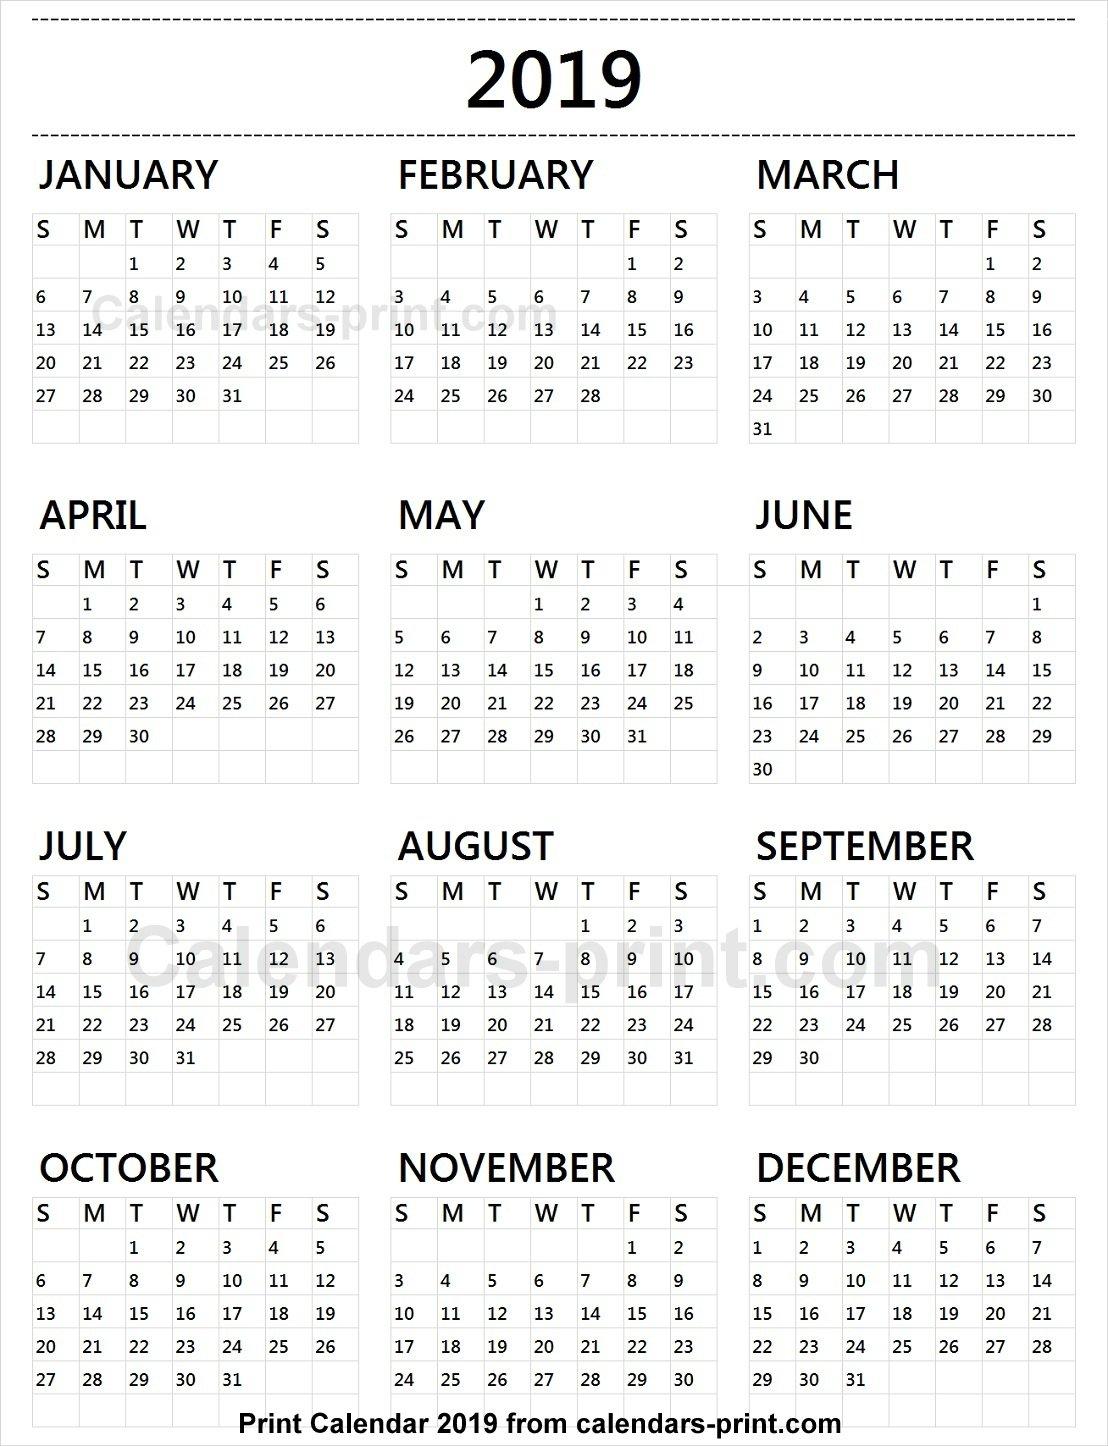 Calendar 2019 Tumblr To Print Free   Download Blank Pdf Template Calendar 2019 Pdf Free Download